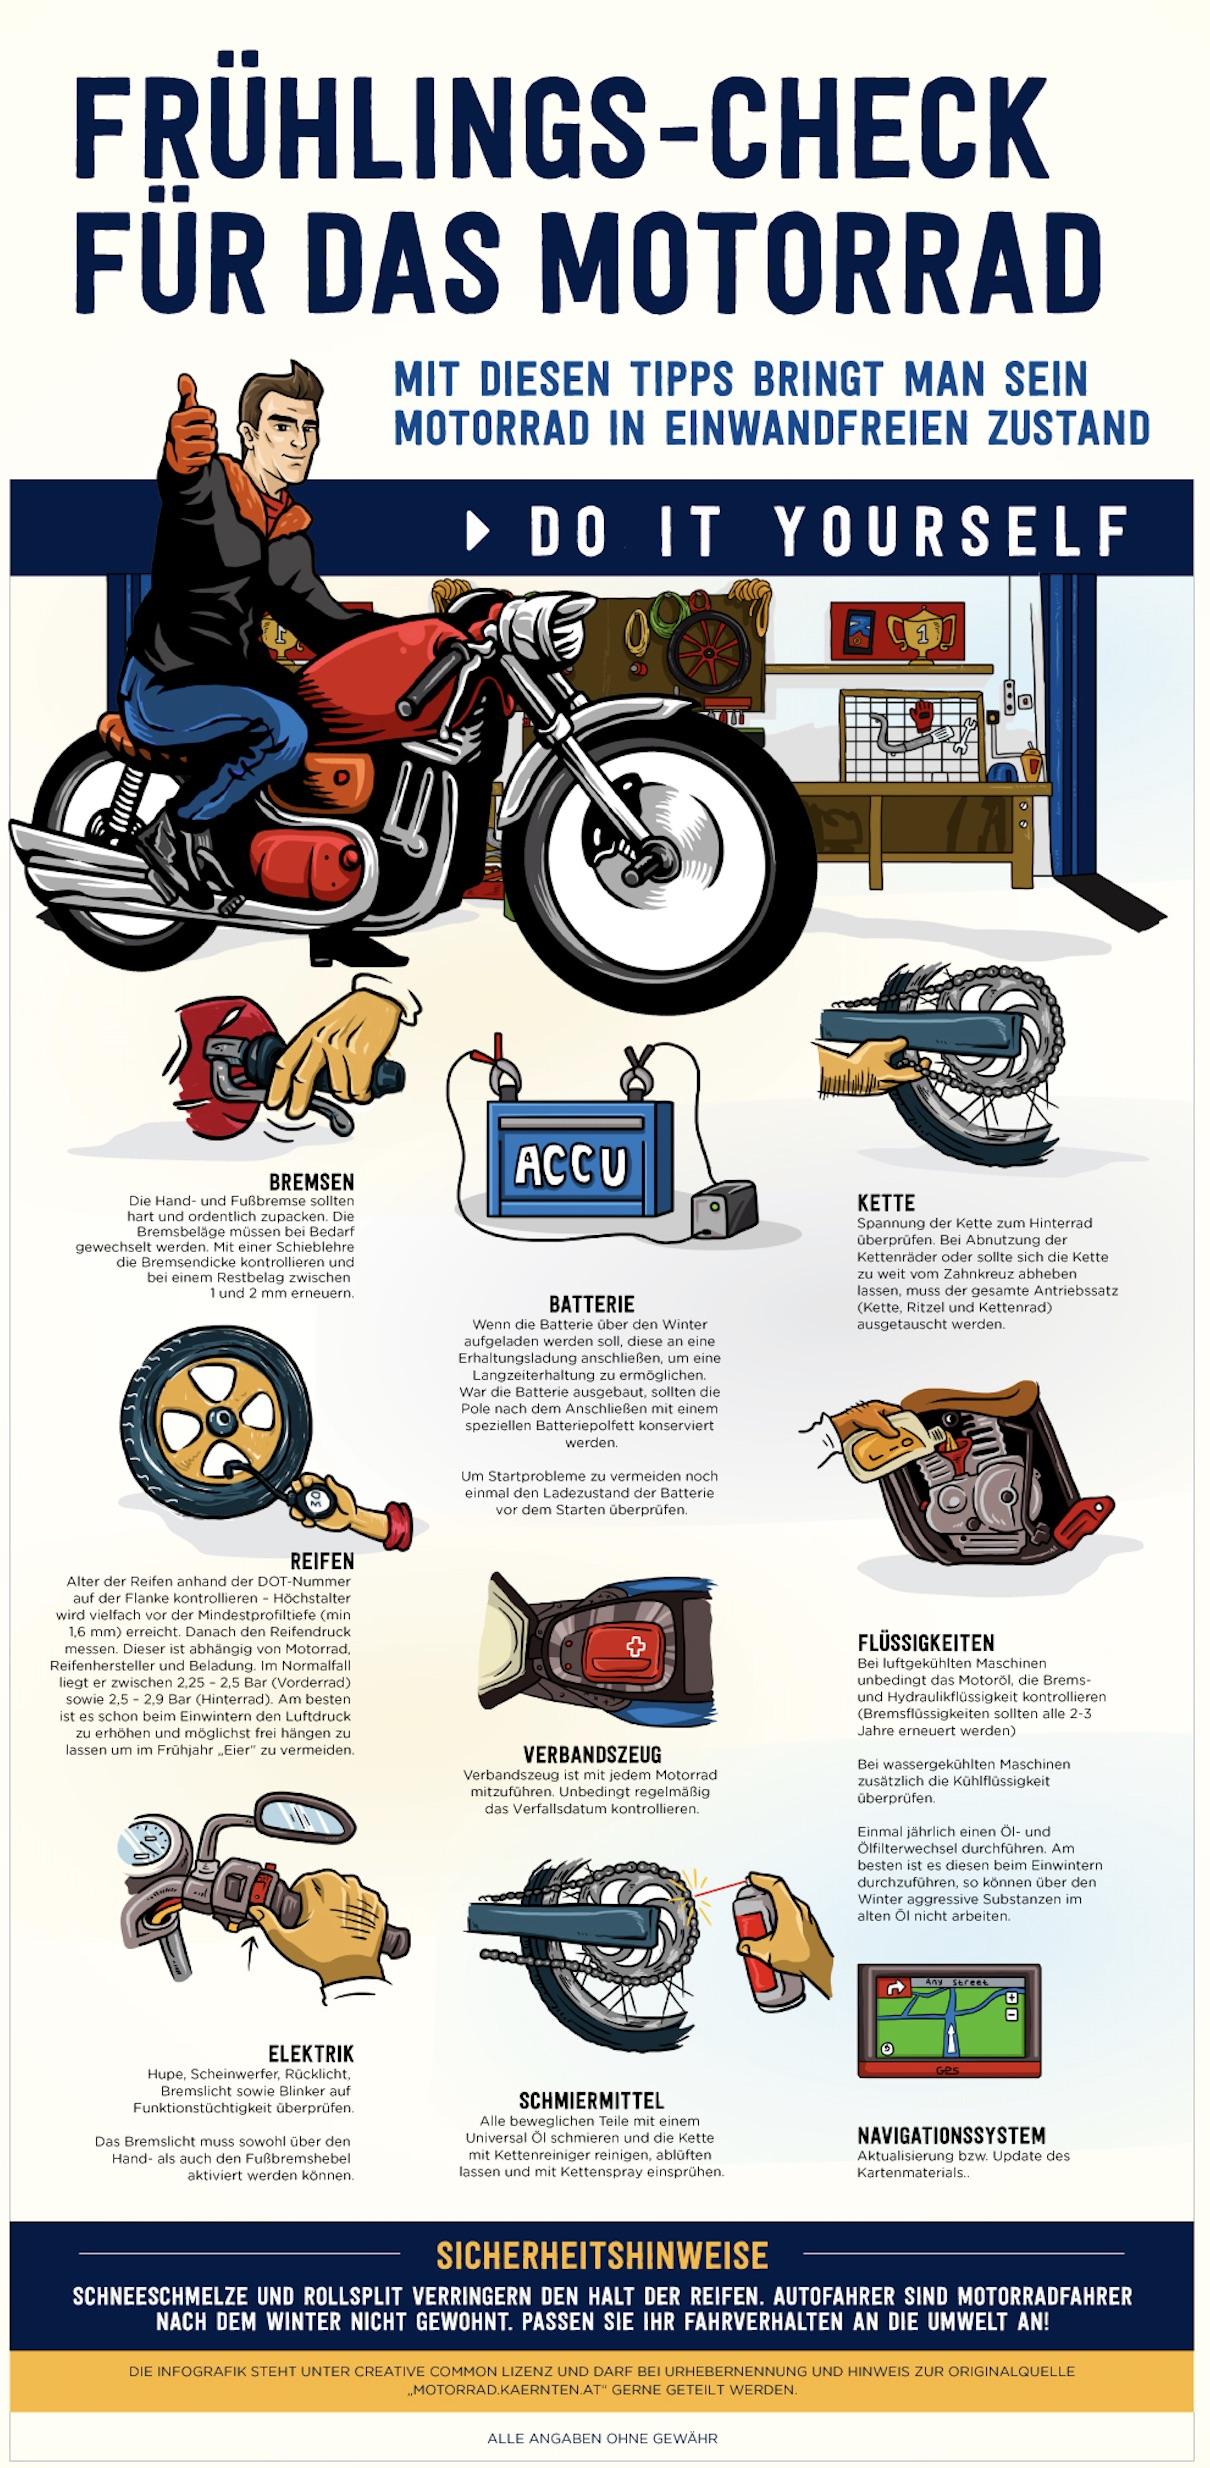 Check-Up für Motorrad im Fruehling